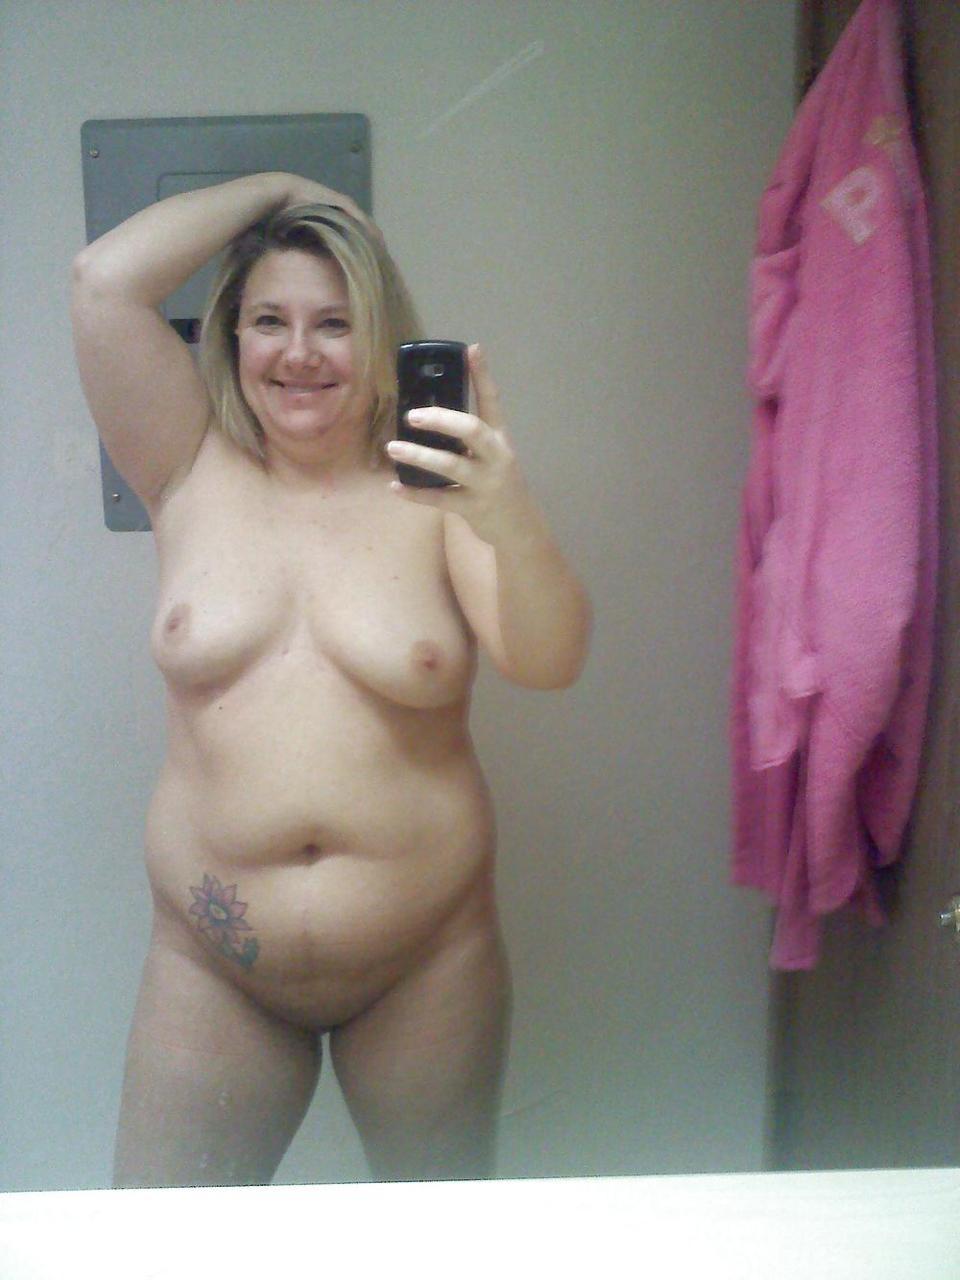 Bbw Plumper Porn amateur chubby, fat, plumper, bbw homemade selfies 14241